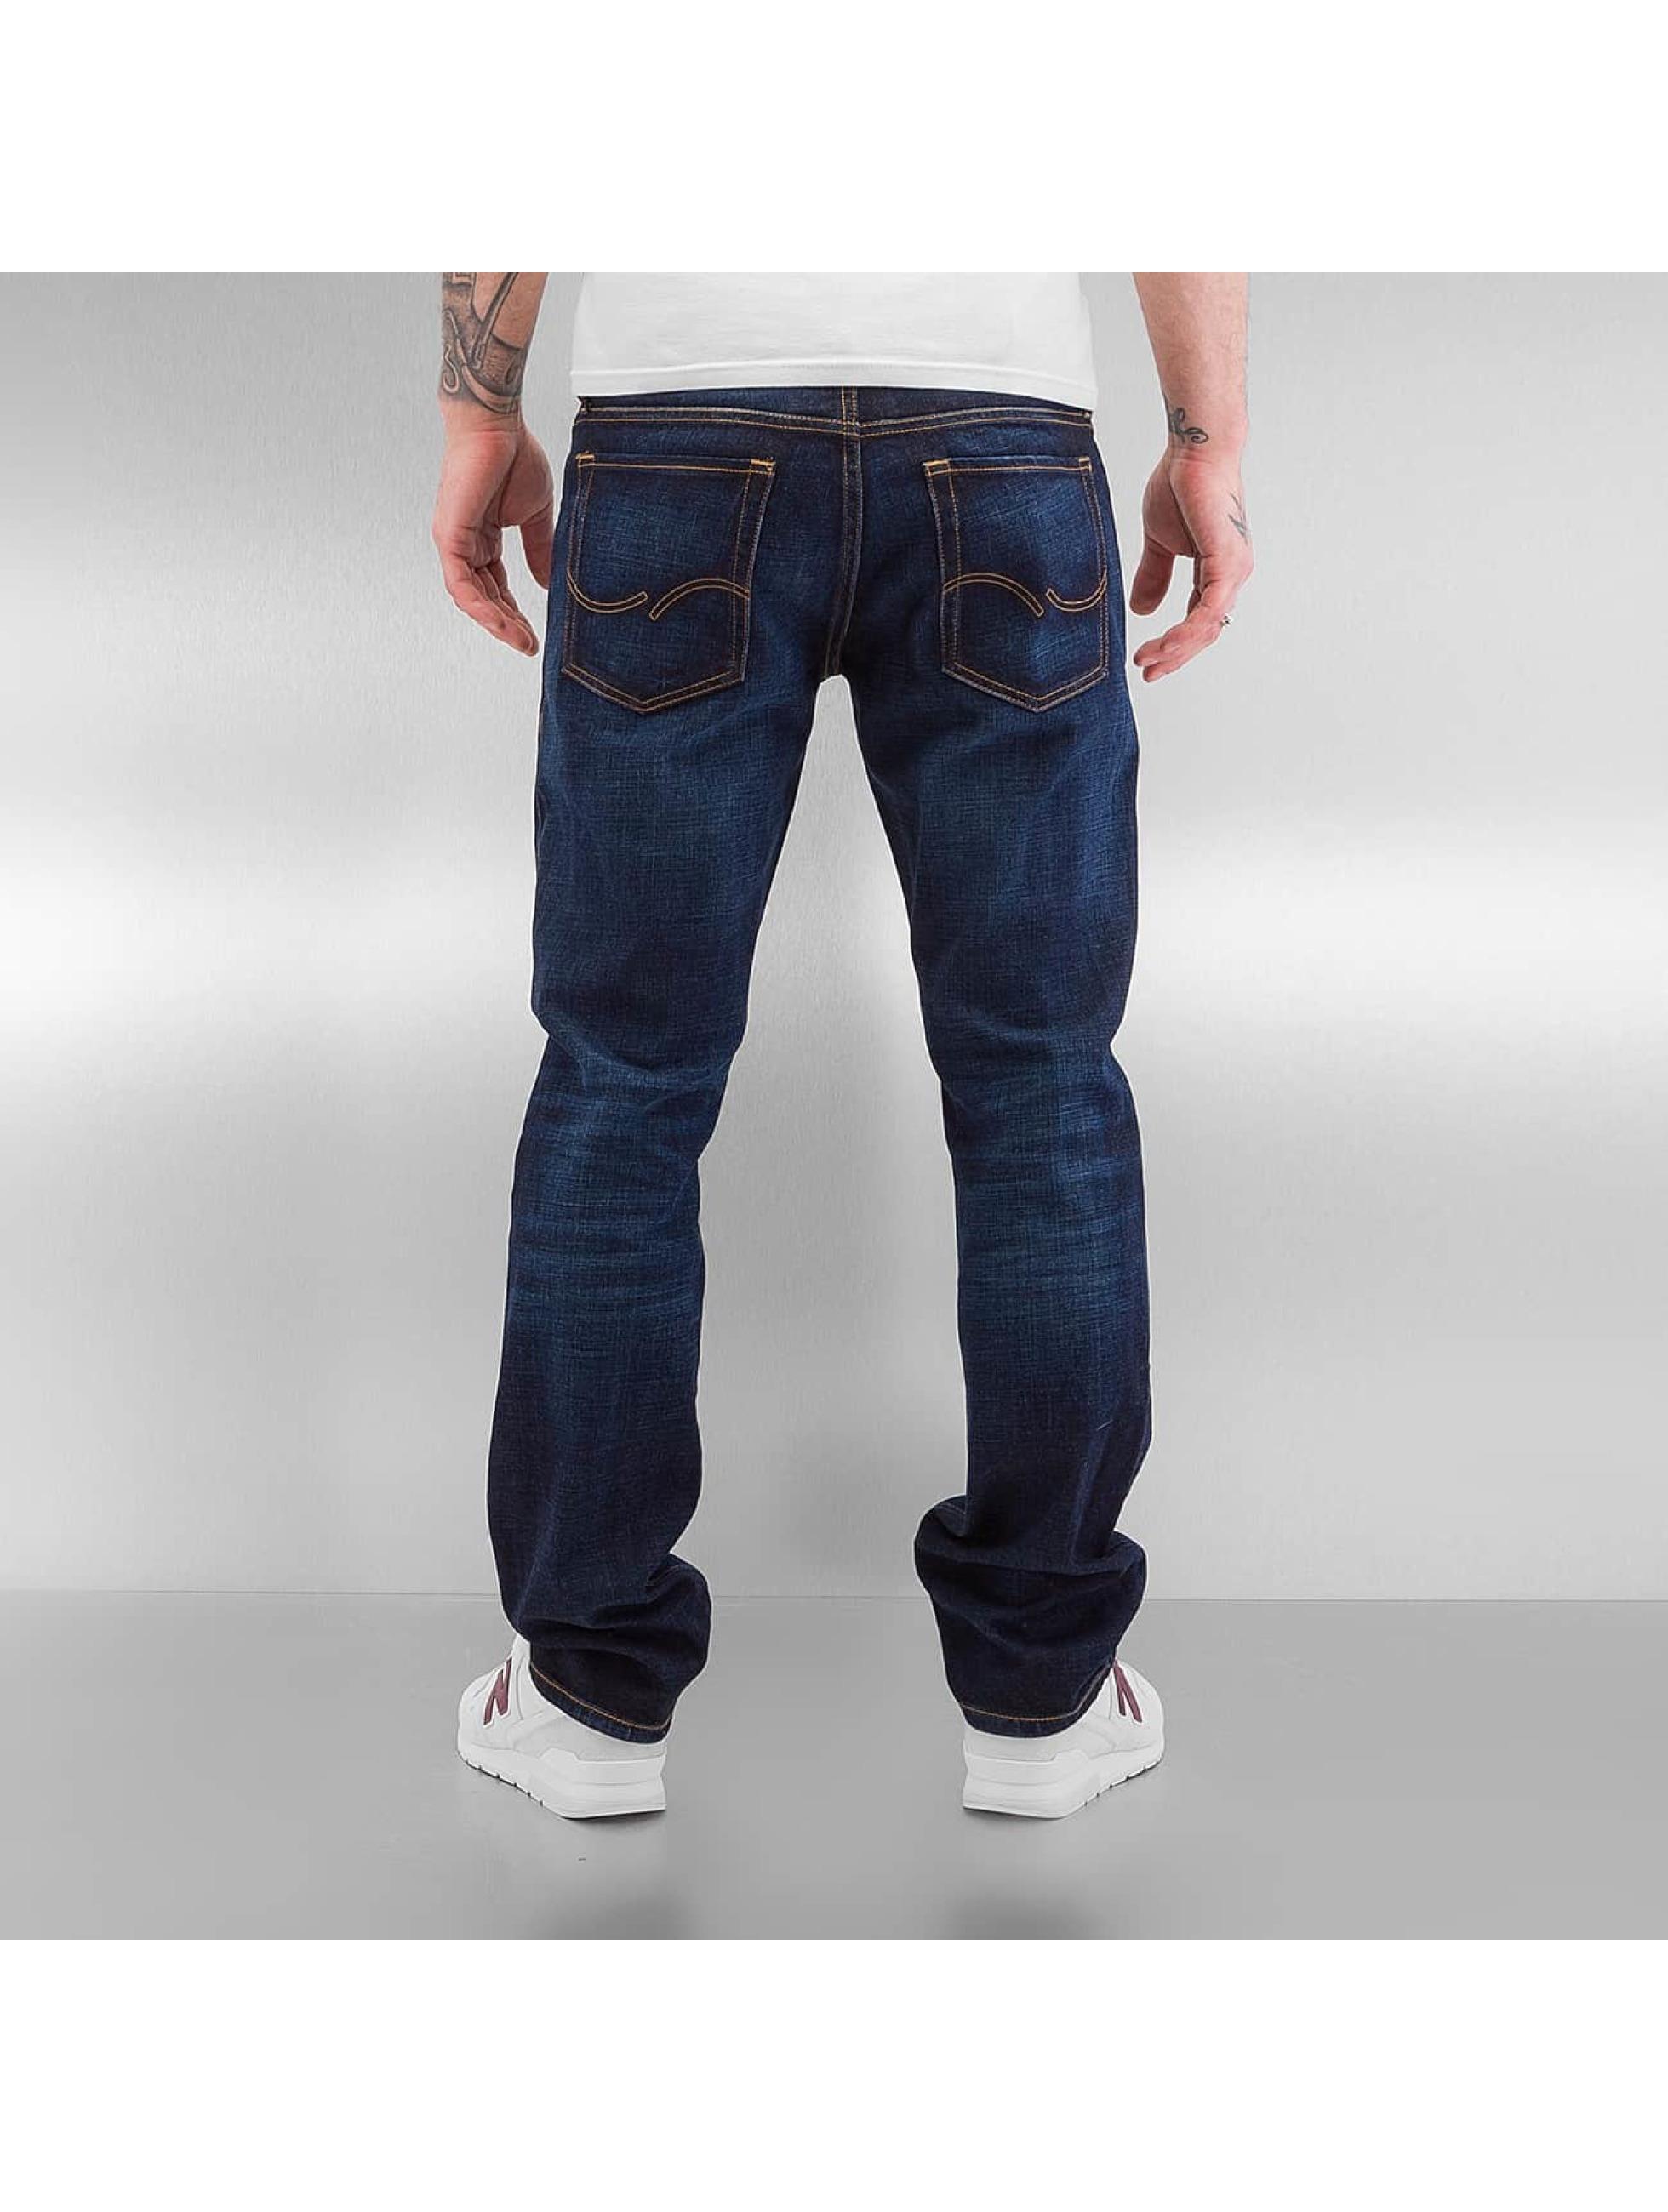 Jack & Jones Straight Fit Jeans jjiClark jjOriginal blue